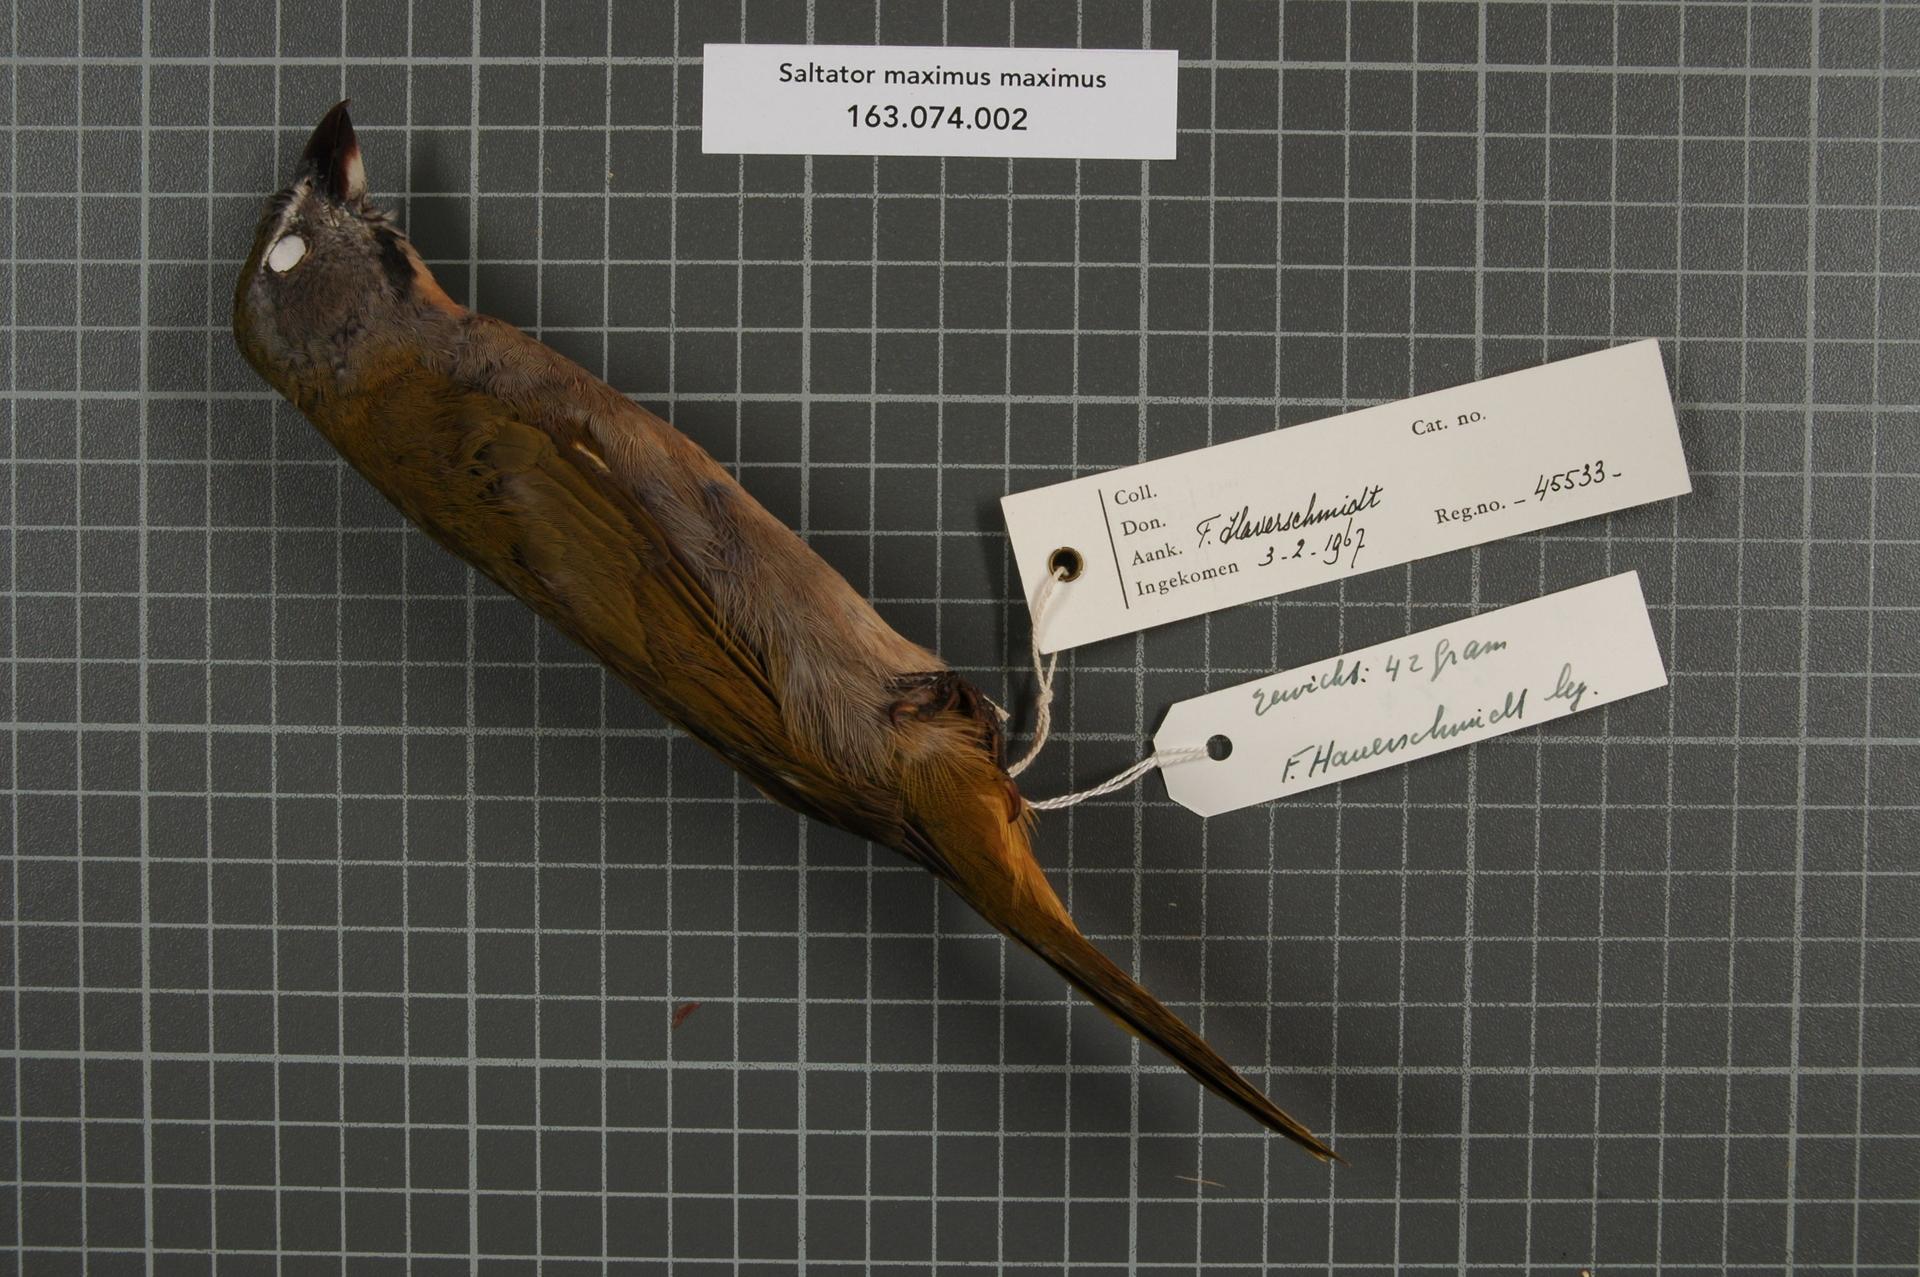 Naturalis_Biodiversity_Center_-_RMNH.AVES.45533_1_-_Saltator_maximus_maximus_%28P.L.S._Muller%2C_1776%29_-_Emberizidae_-_bird_skin_specimen.jpeg